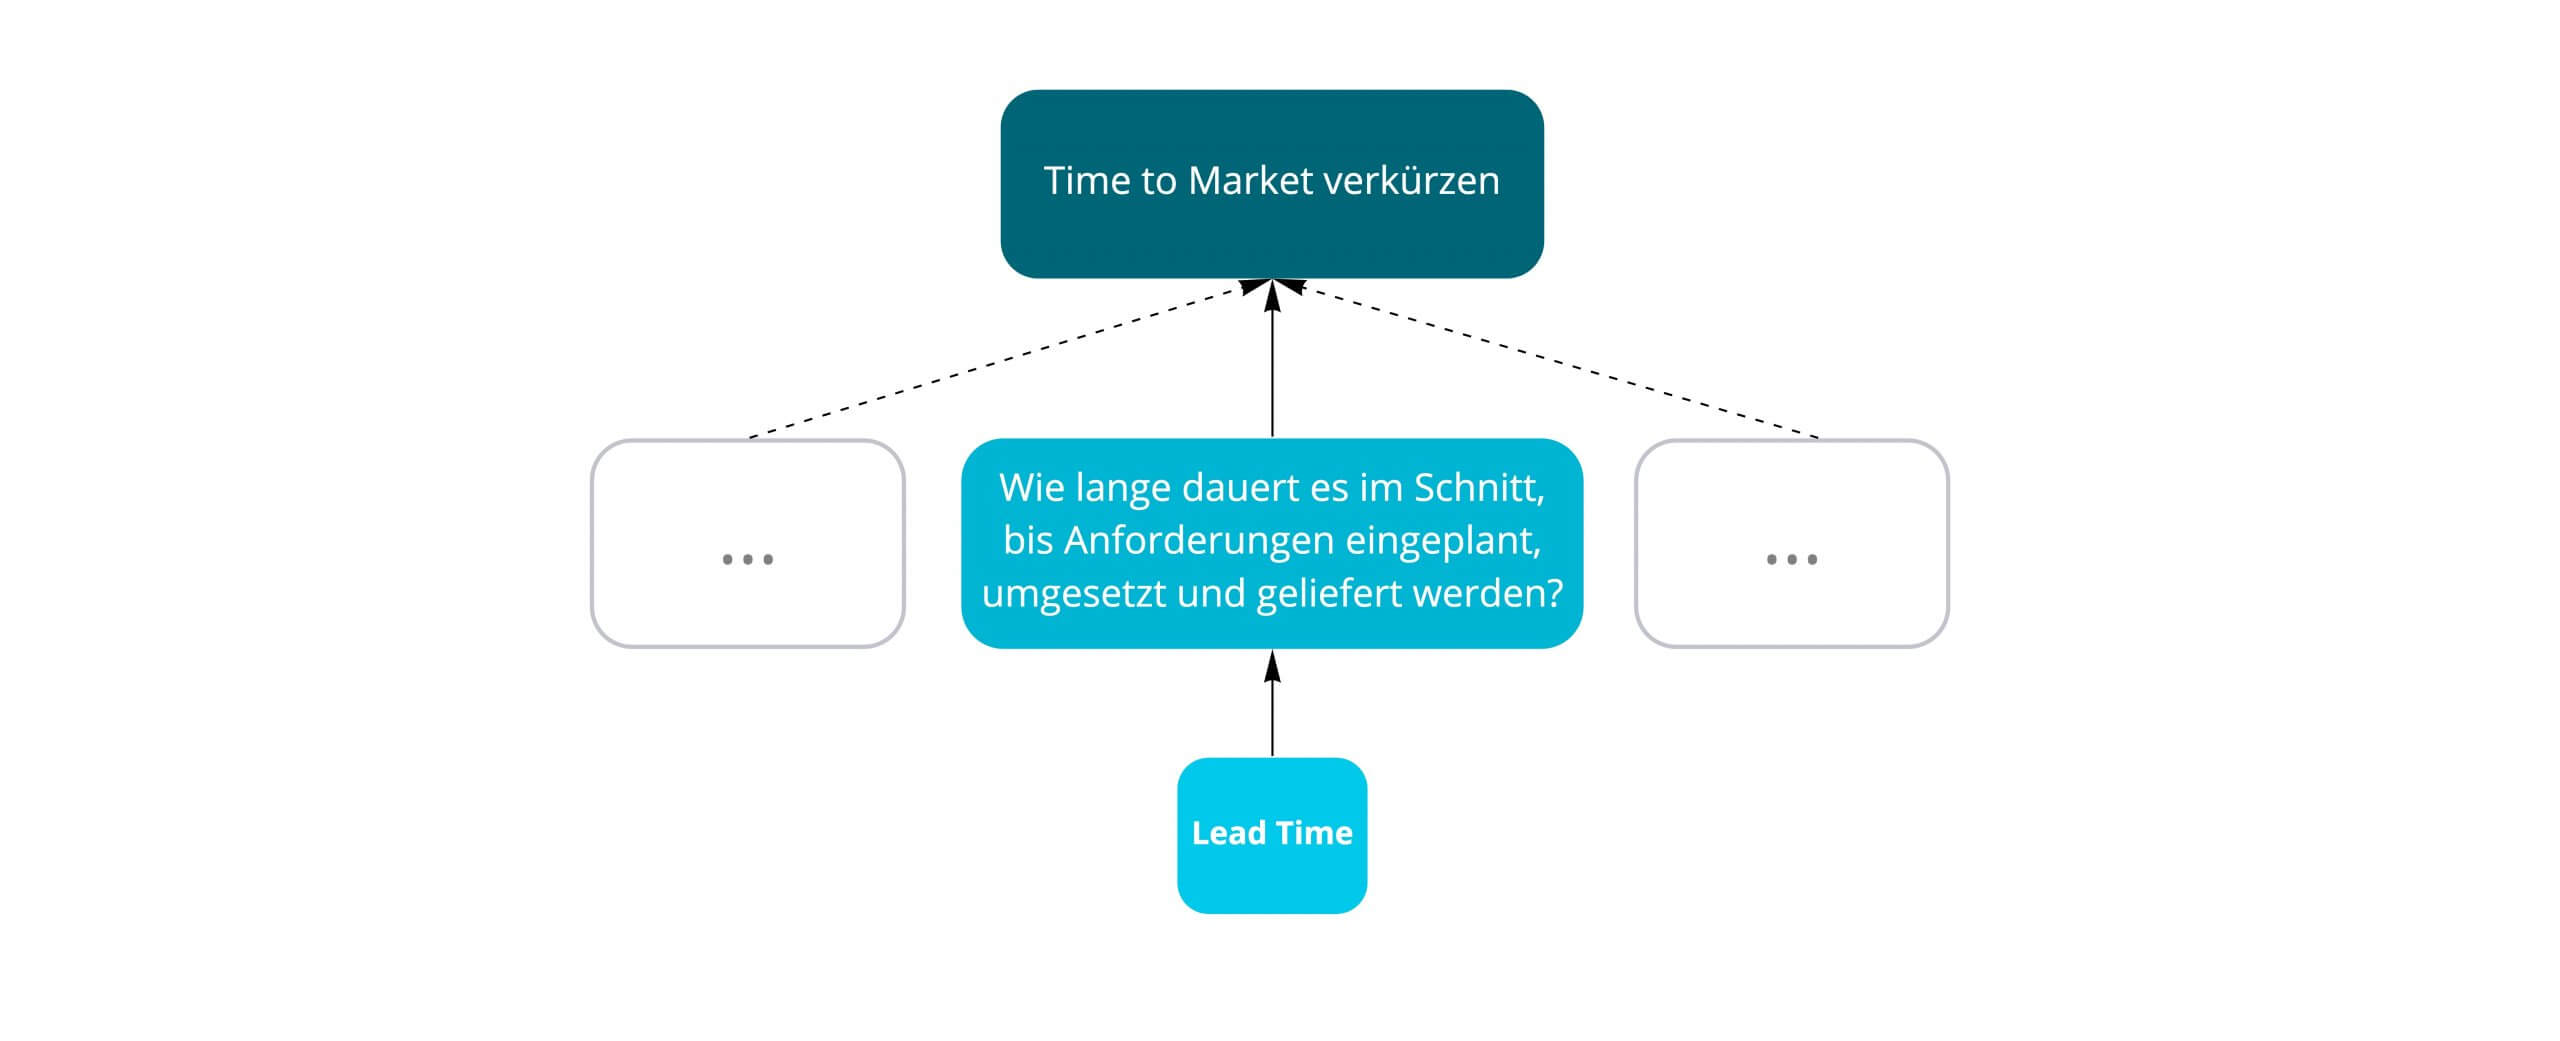 Lead Time als Metrik für Time to Market